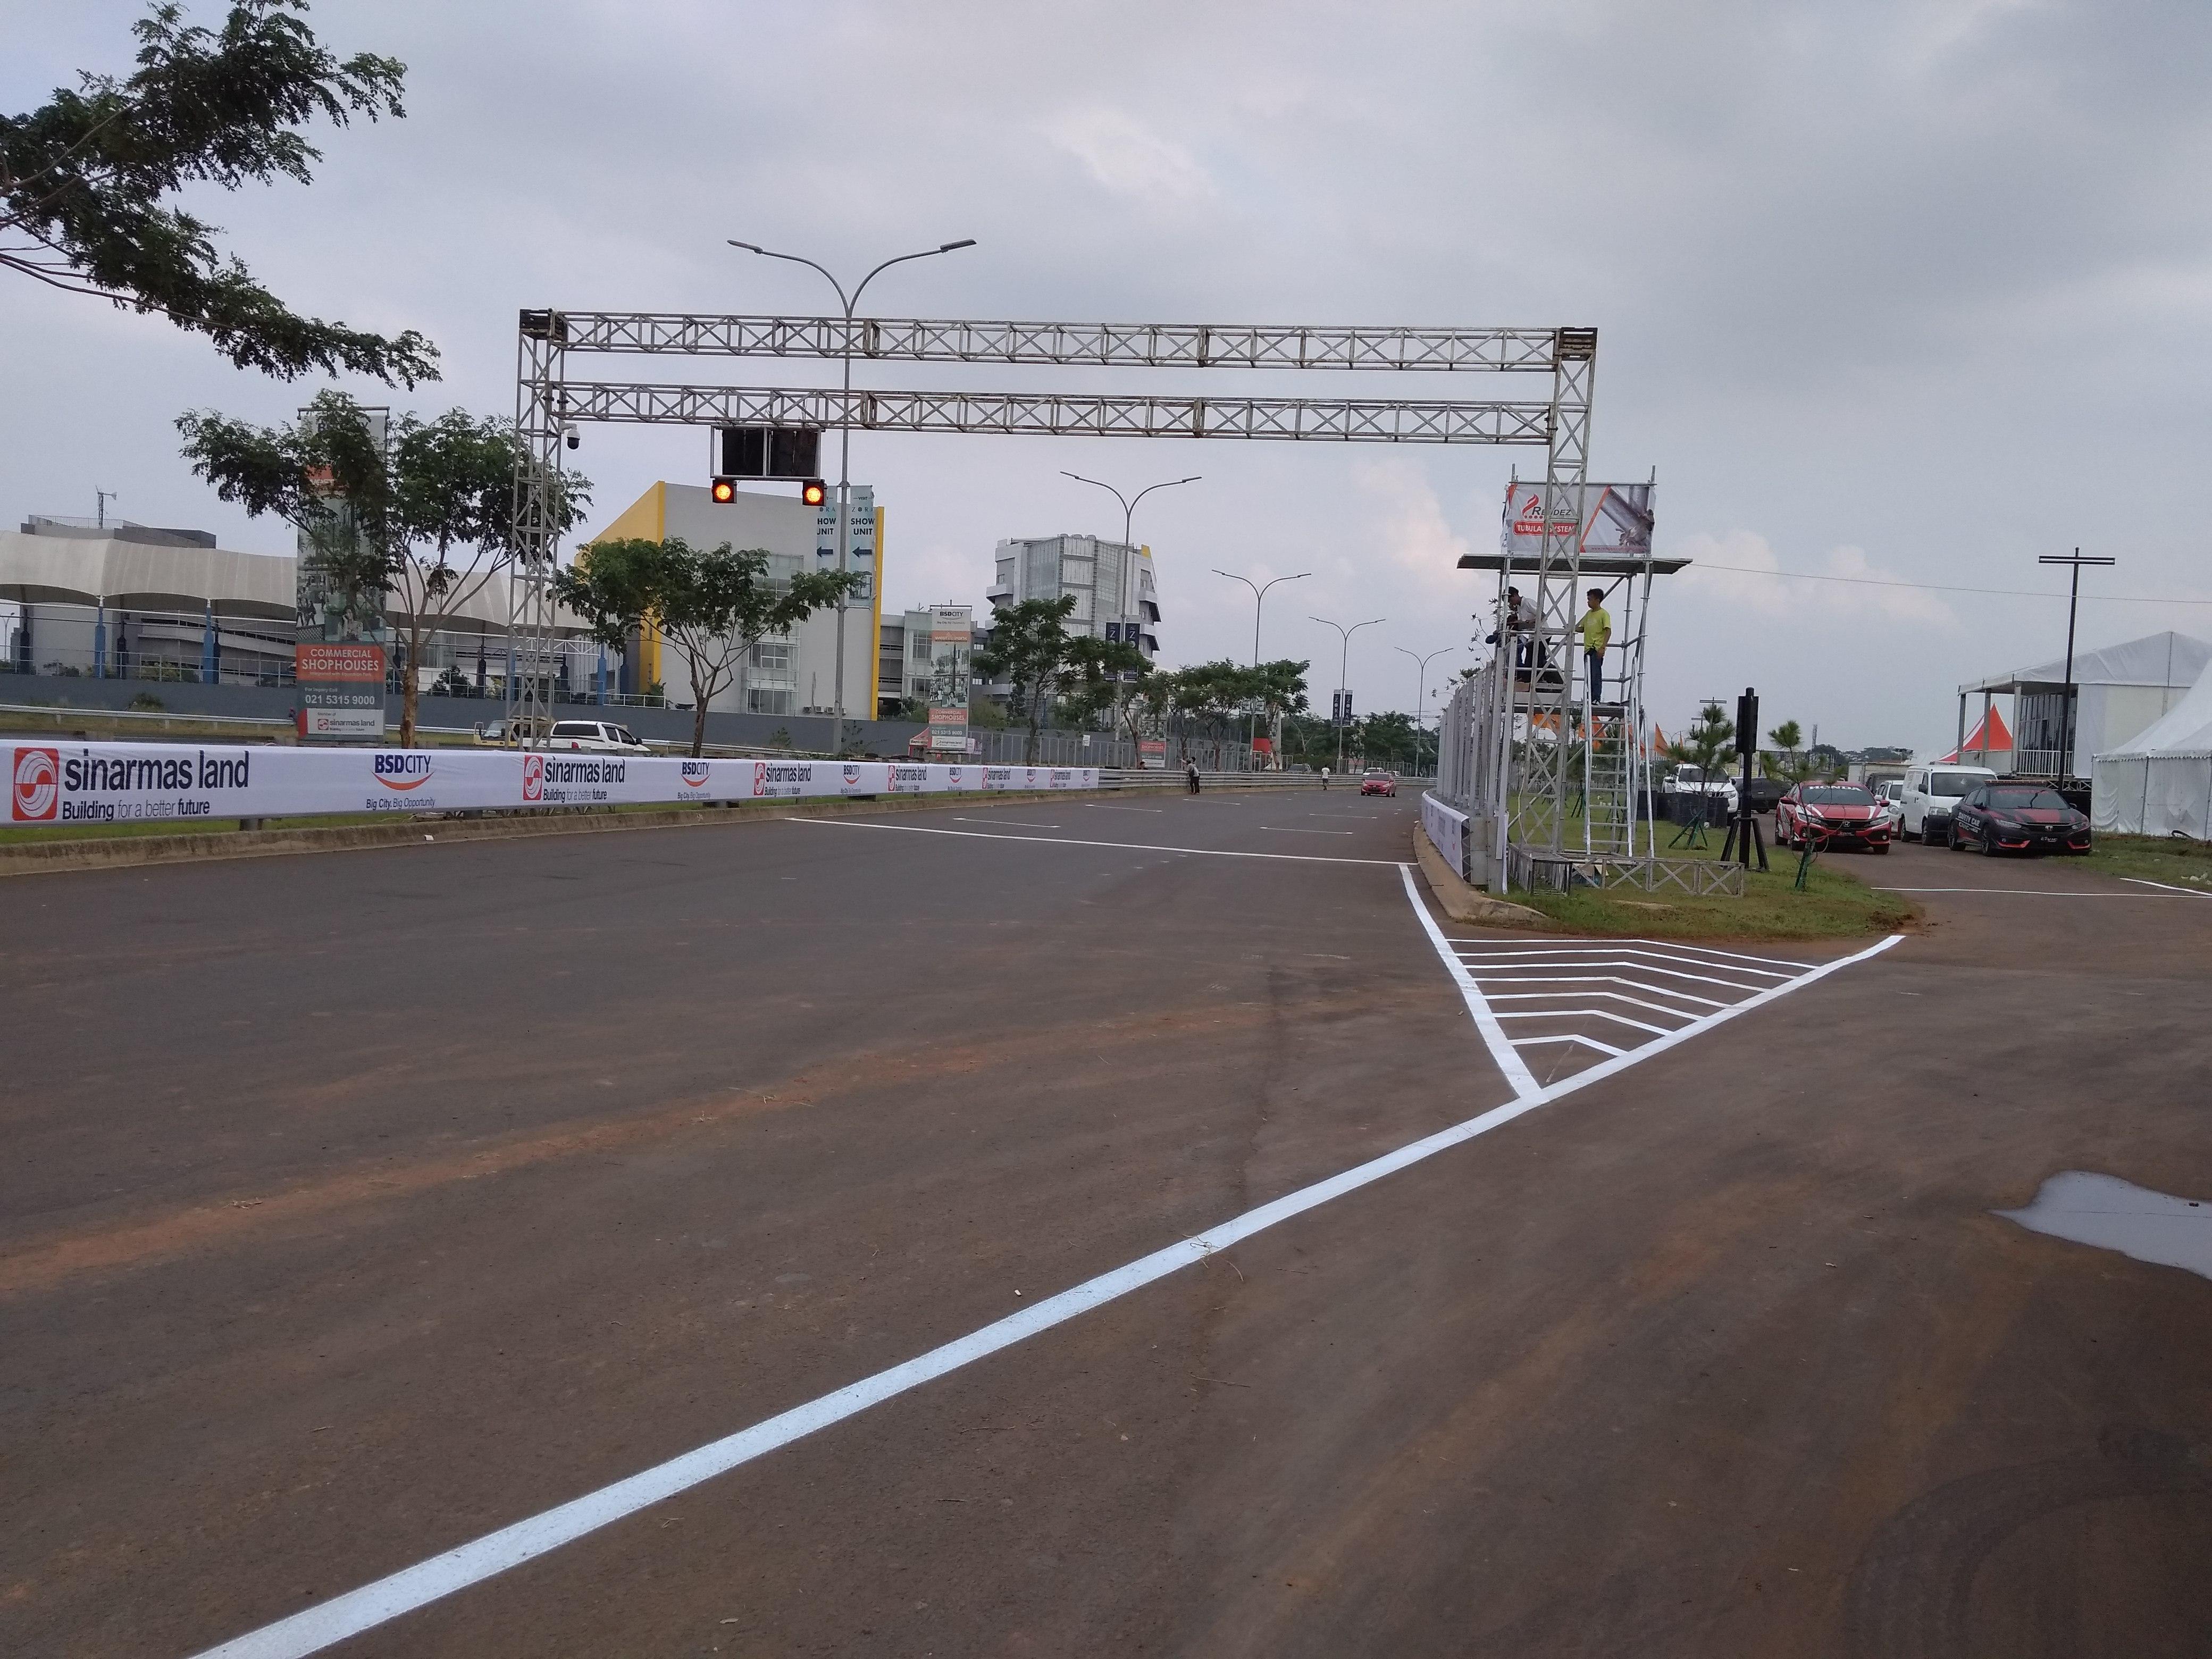 Lintasan yang akan digunakan para pembalap BSD City Grand Prix 2018